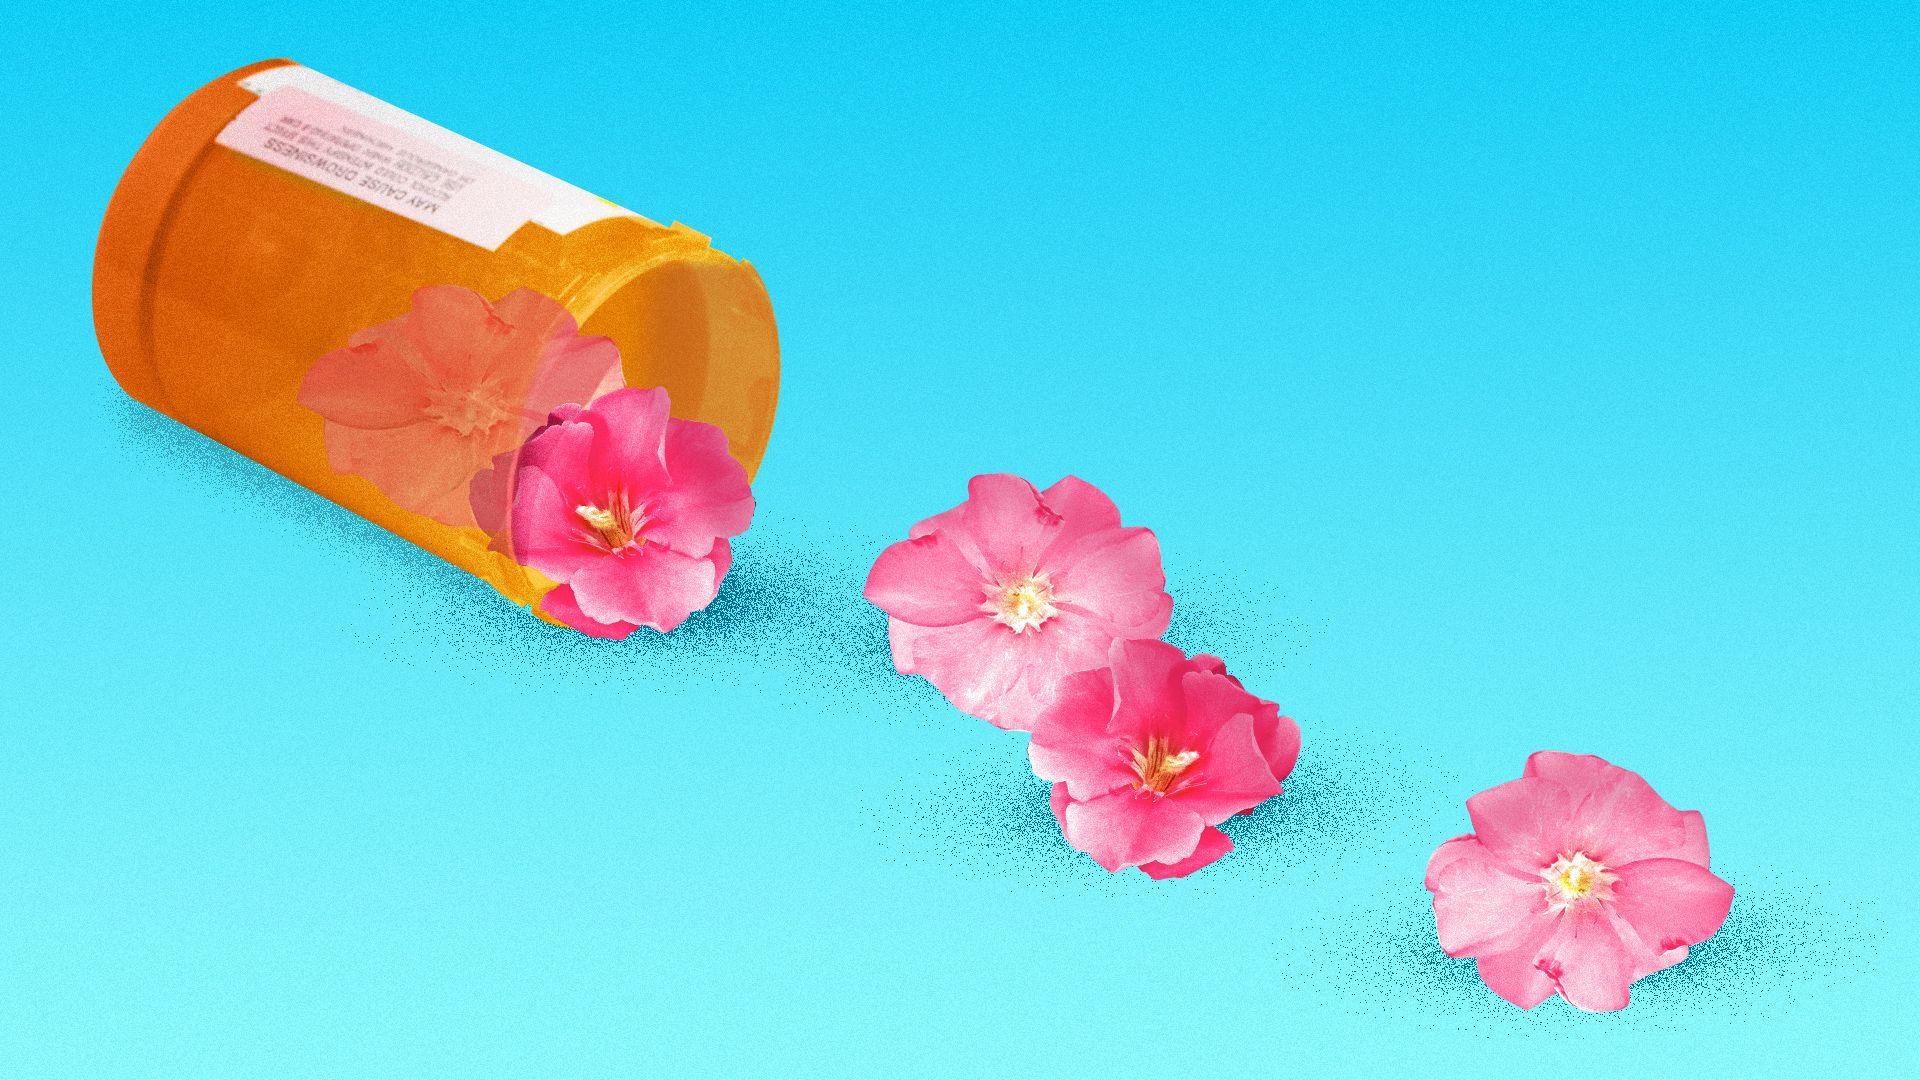 Illustration of a medicine bottle tipped on its side with oleander flowers spilling out.